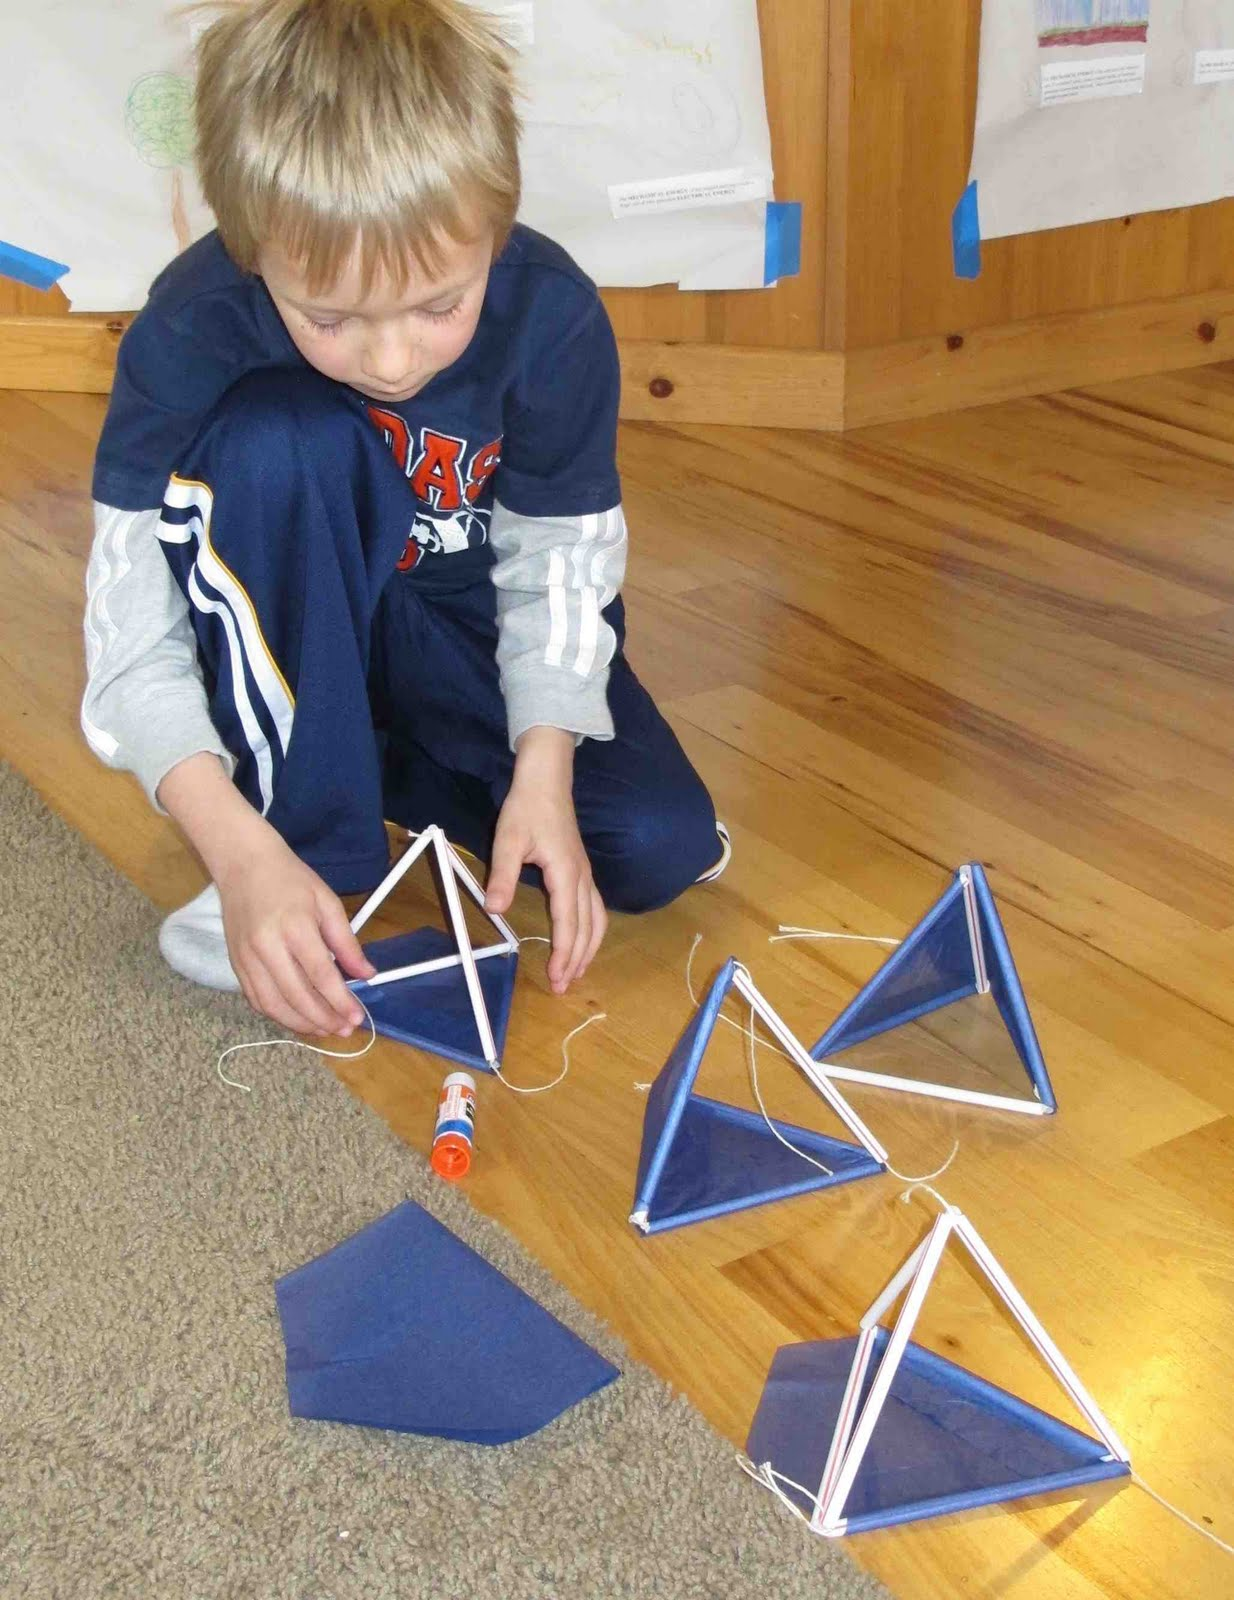 Building Tetrahedron Kites Eva Varga